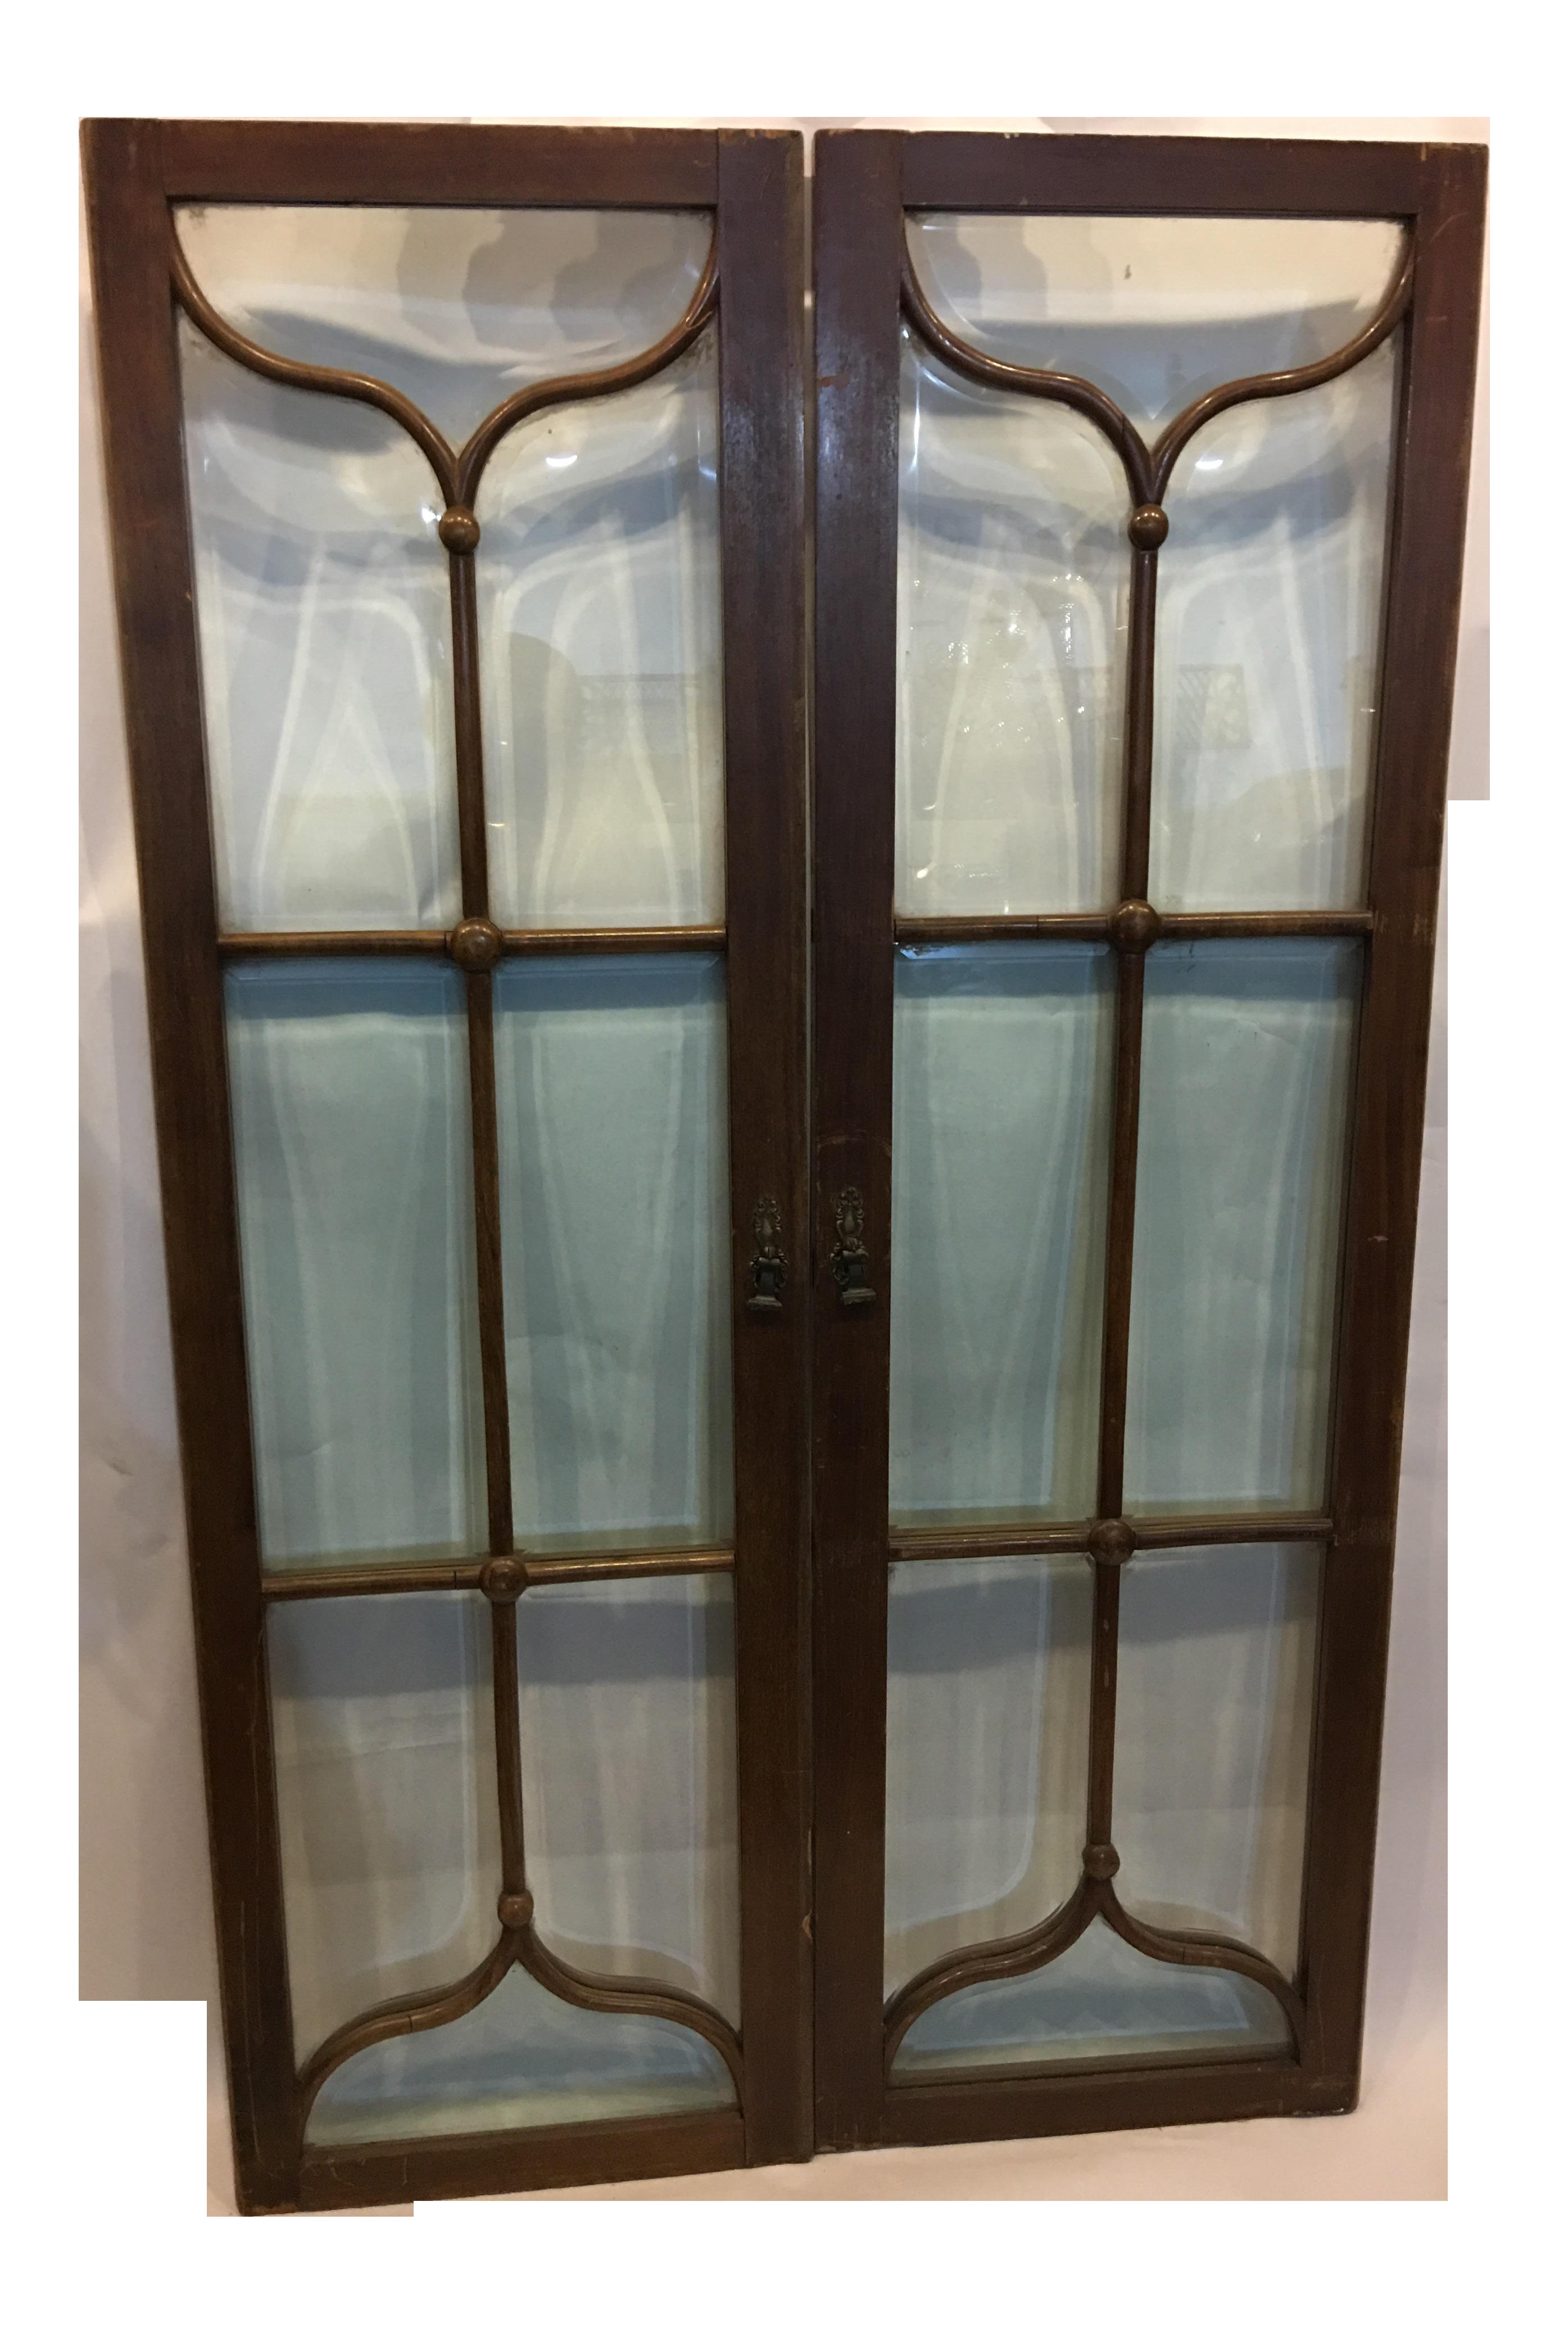 Edwardian Mahogany Beveled Glass Doors A Pair Chairish